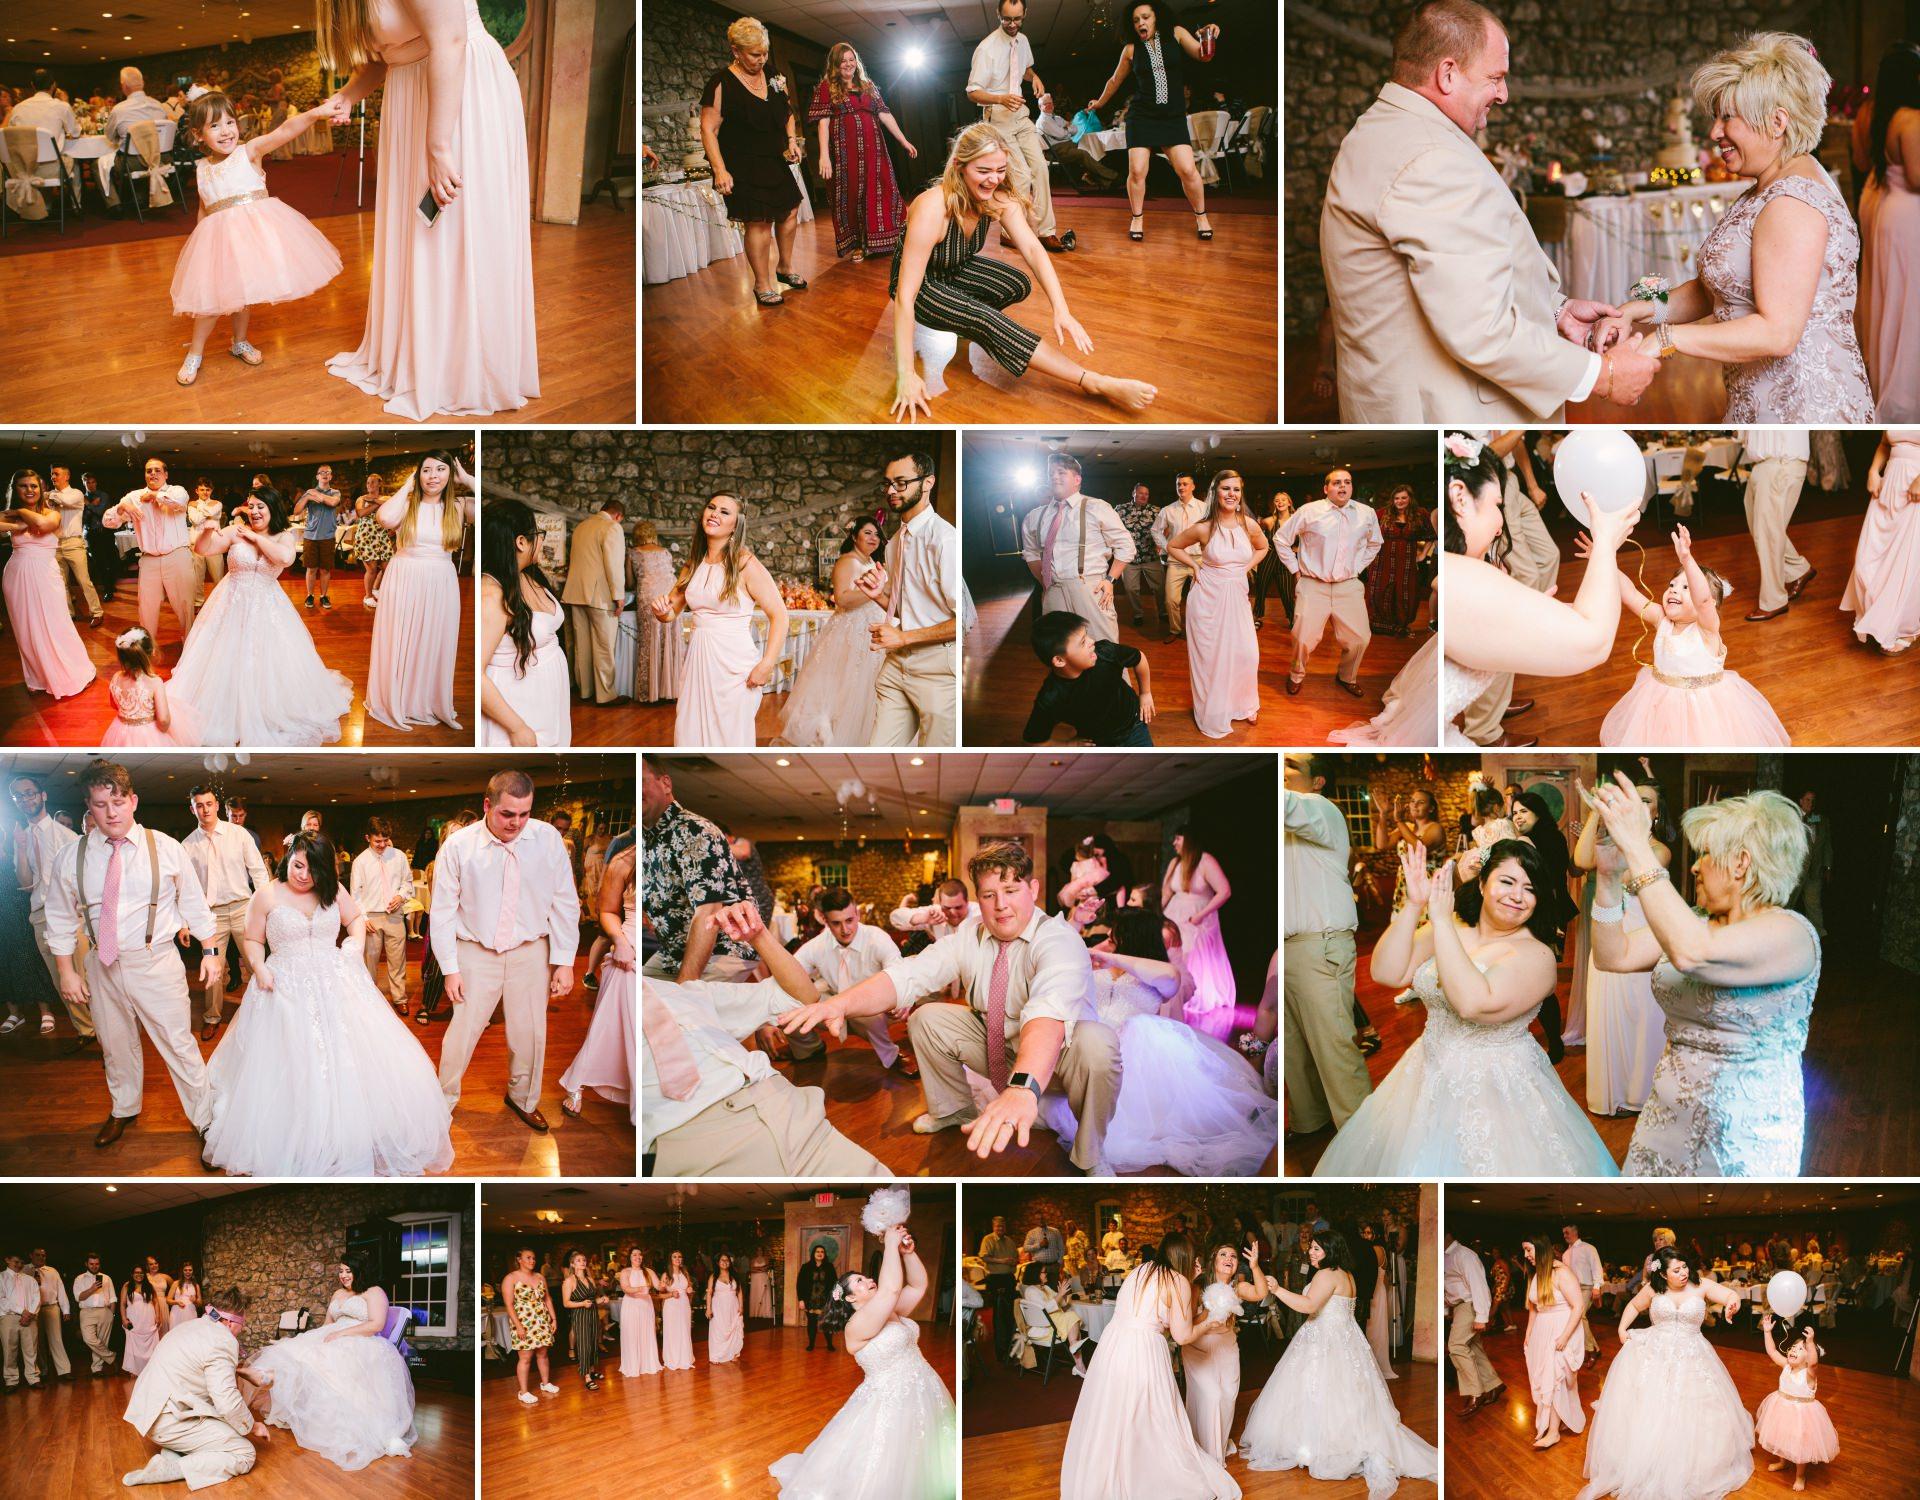 Mon Ami Winery Wedding in Port Clinton 2 5.jpg